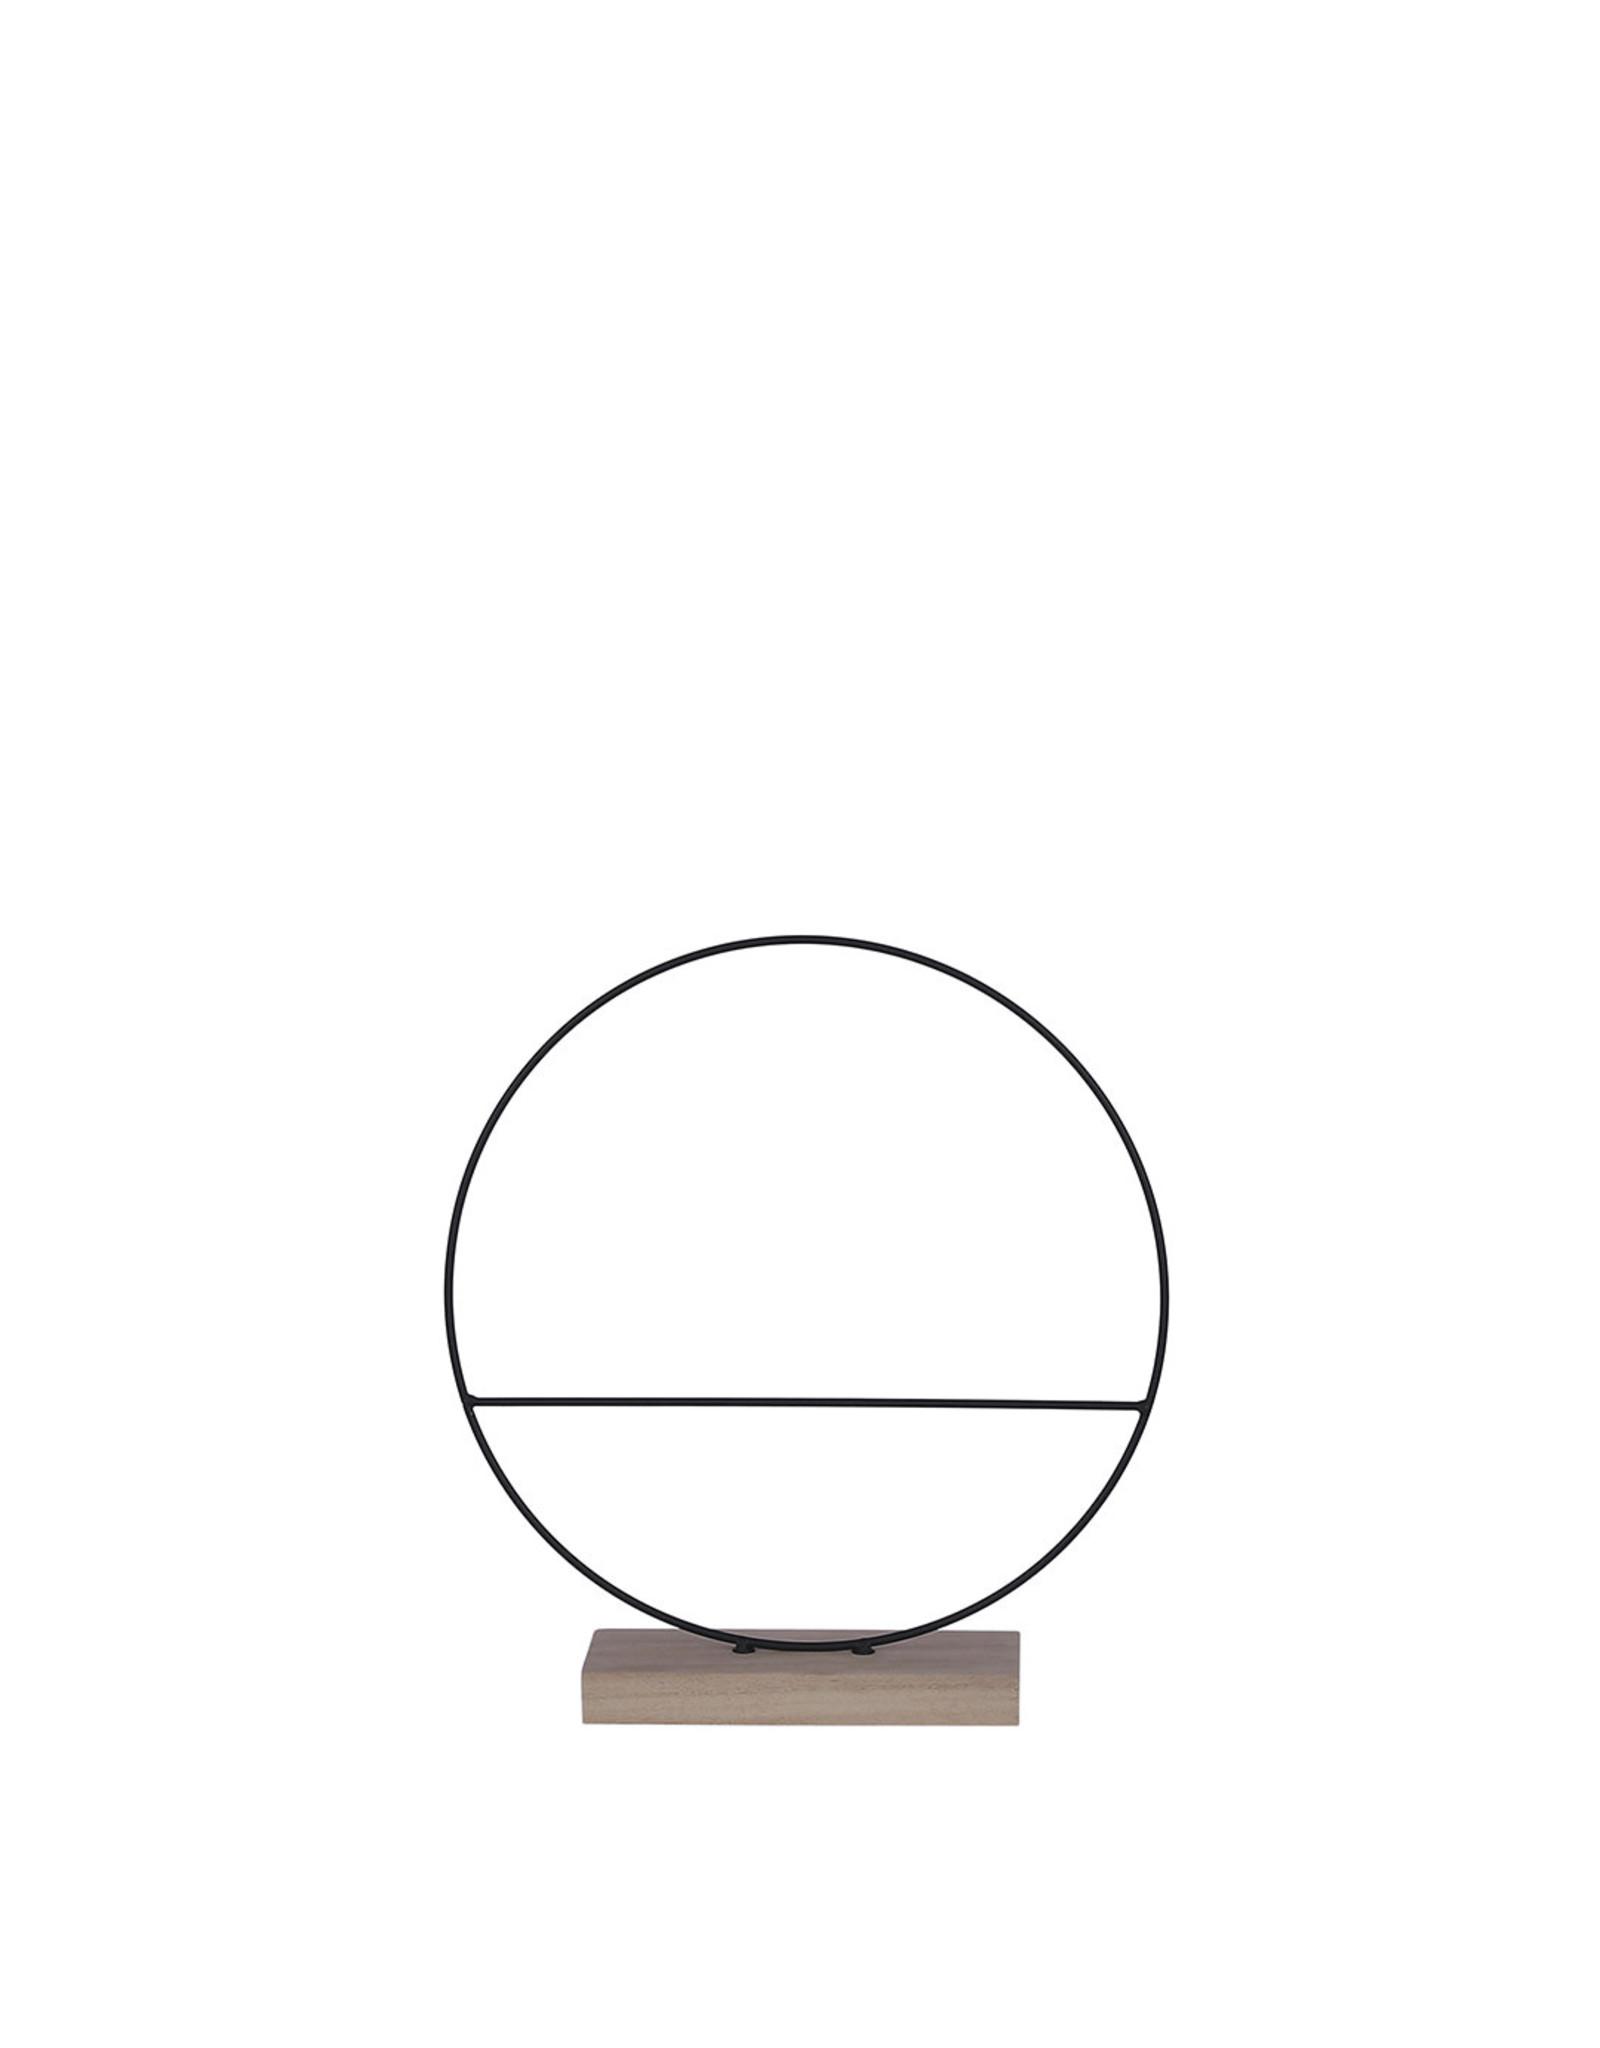 Decoration circle black - w7xd30cm